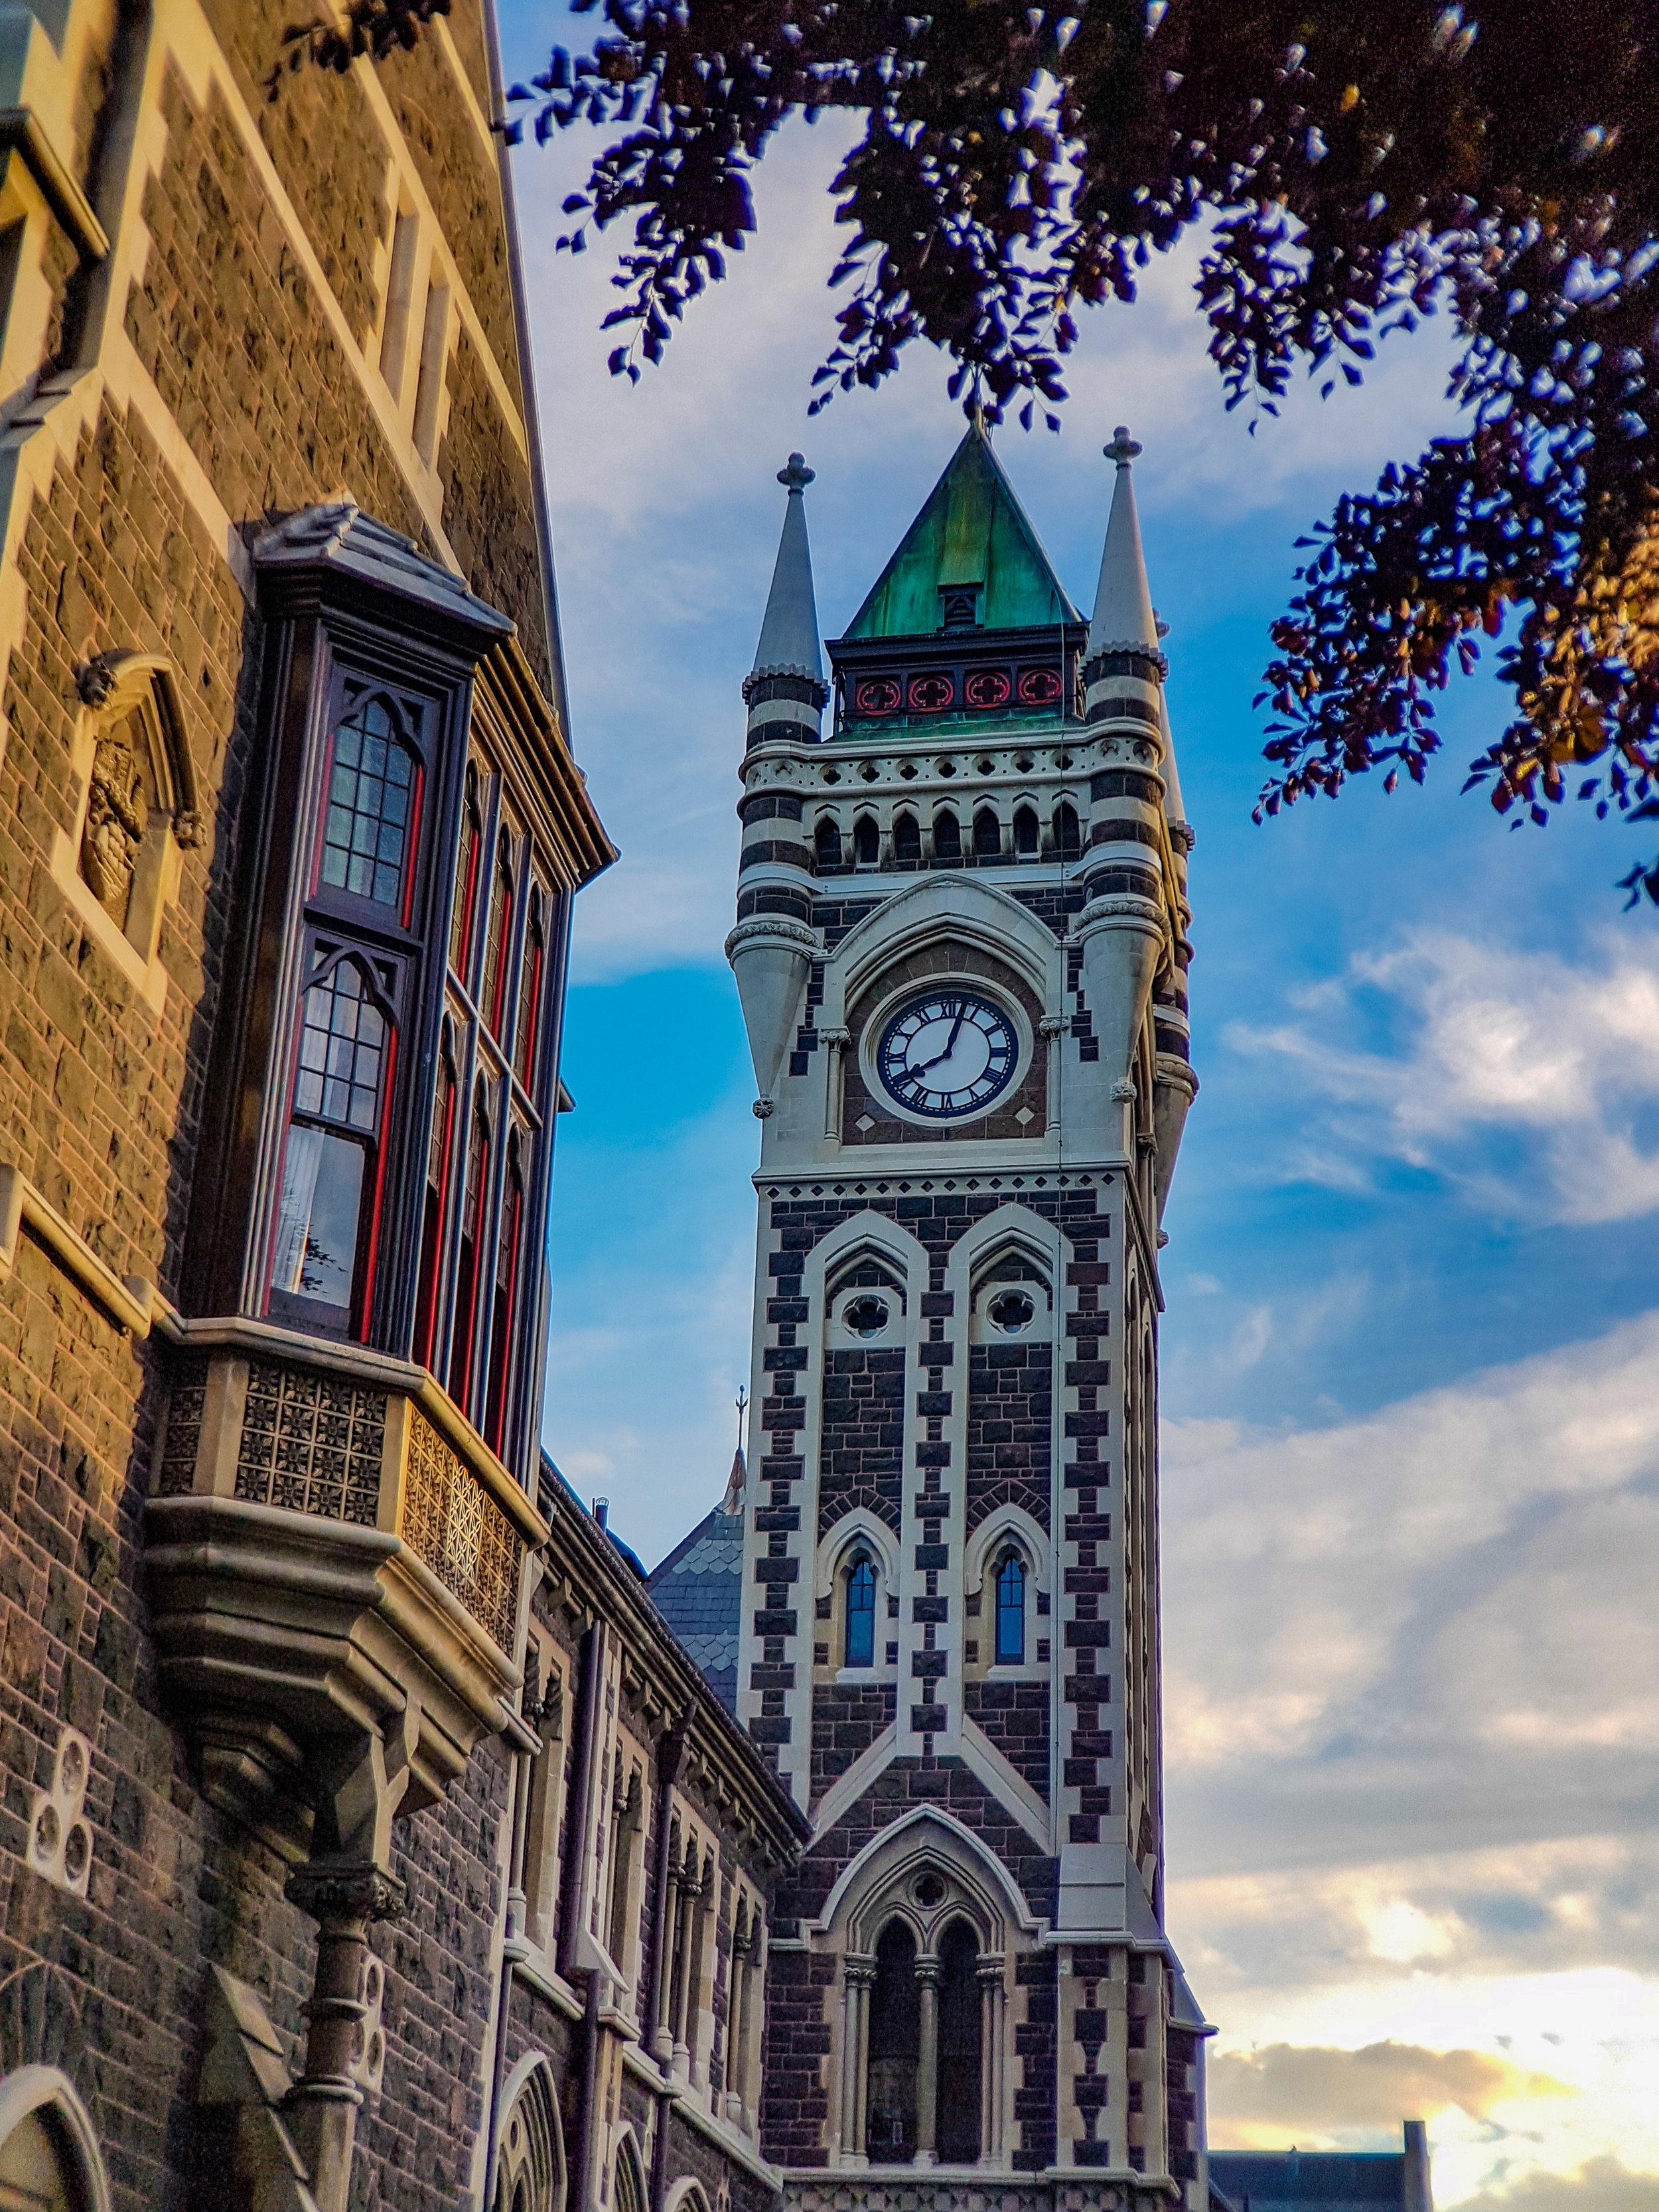 University of Otago Clocktower